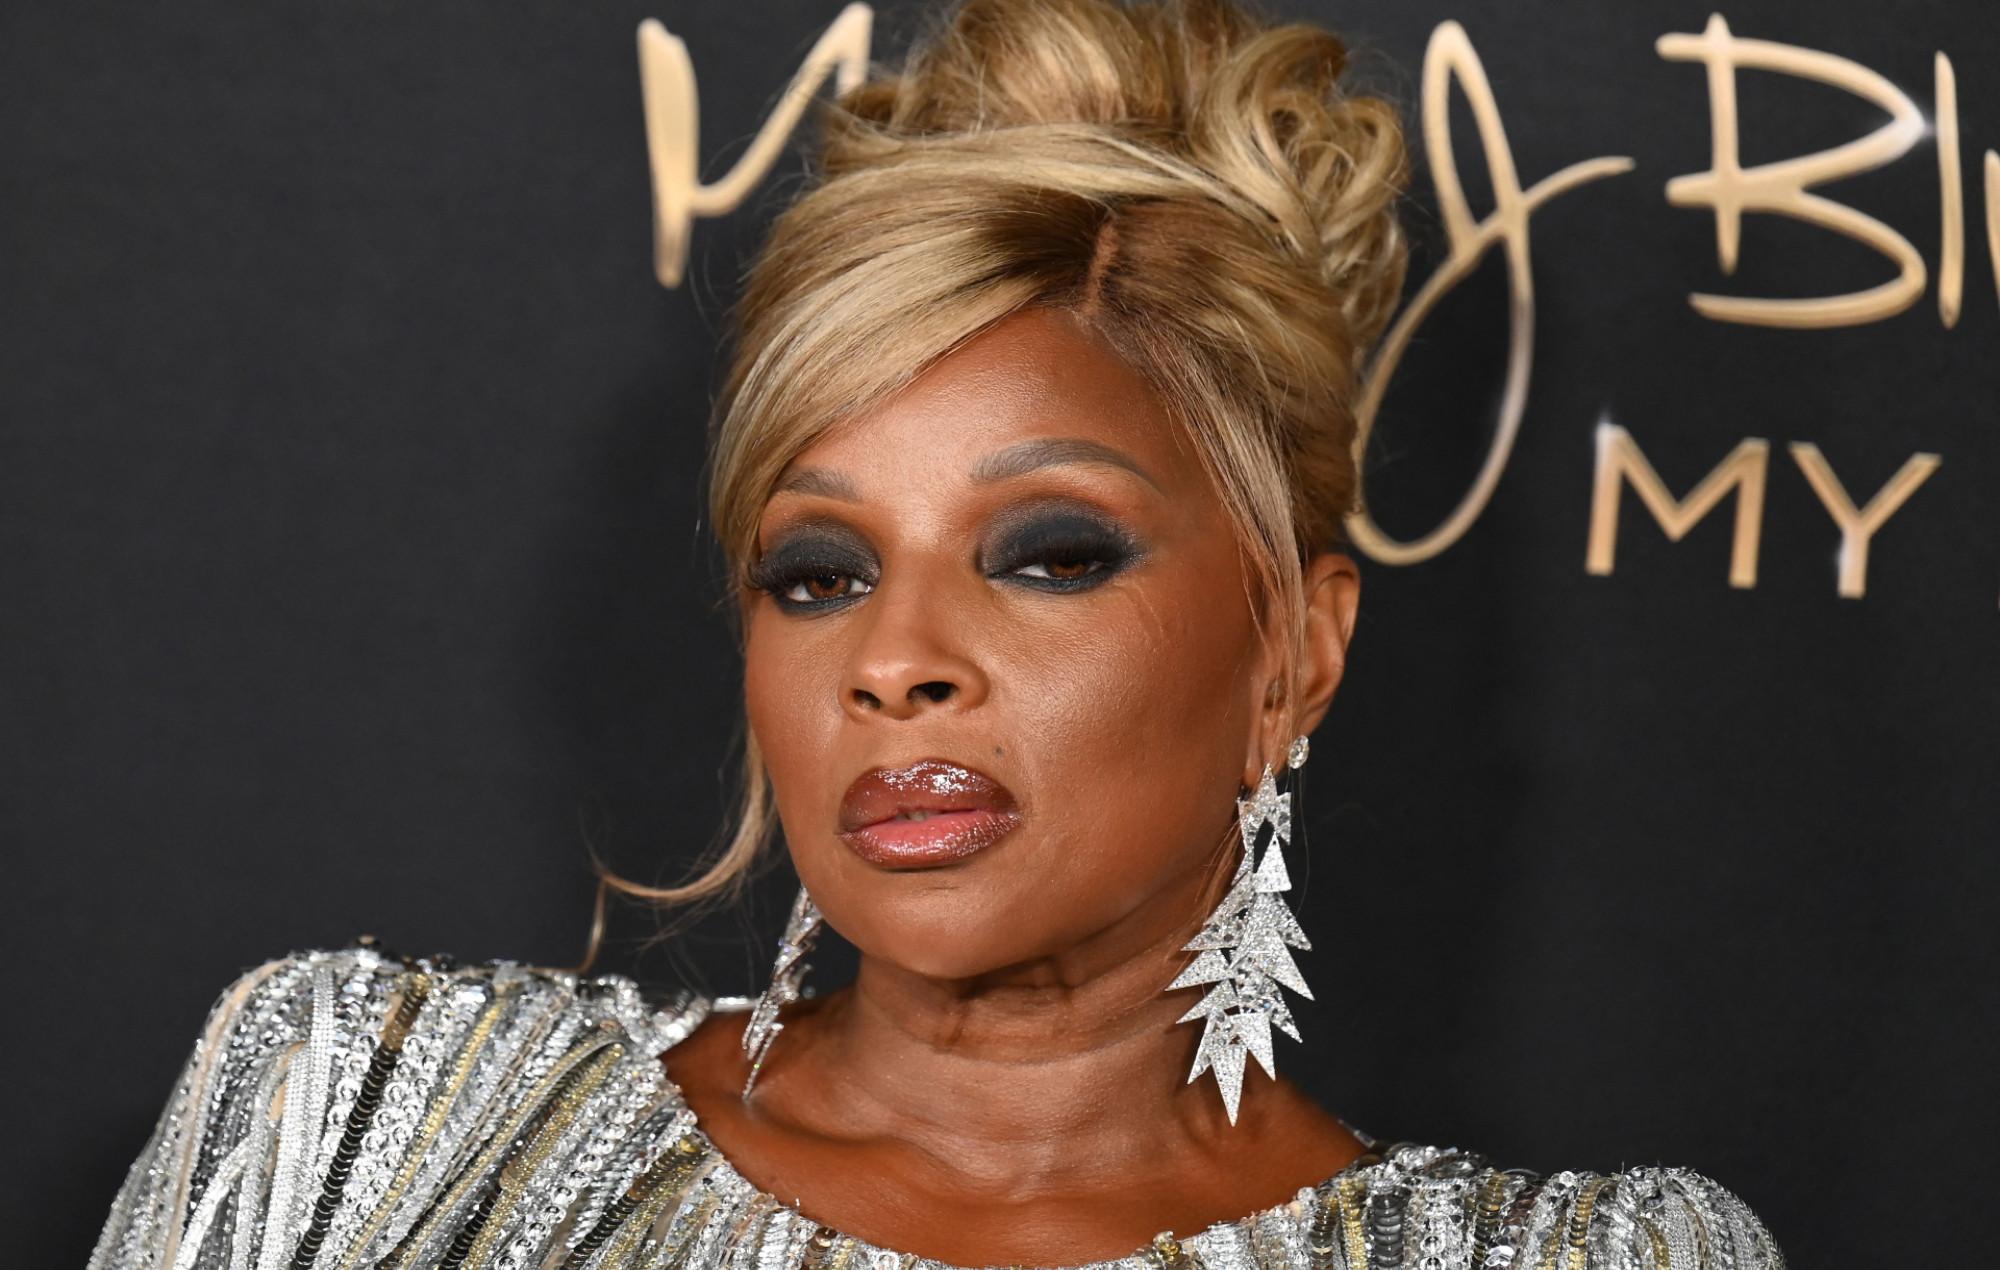 Mary J. Blige shuts down idea of taking part in a Verzuz battle